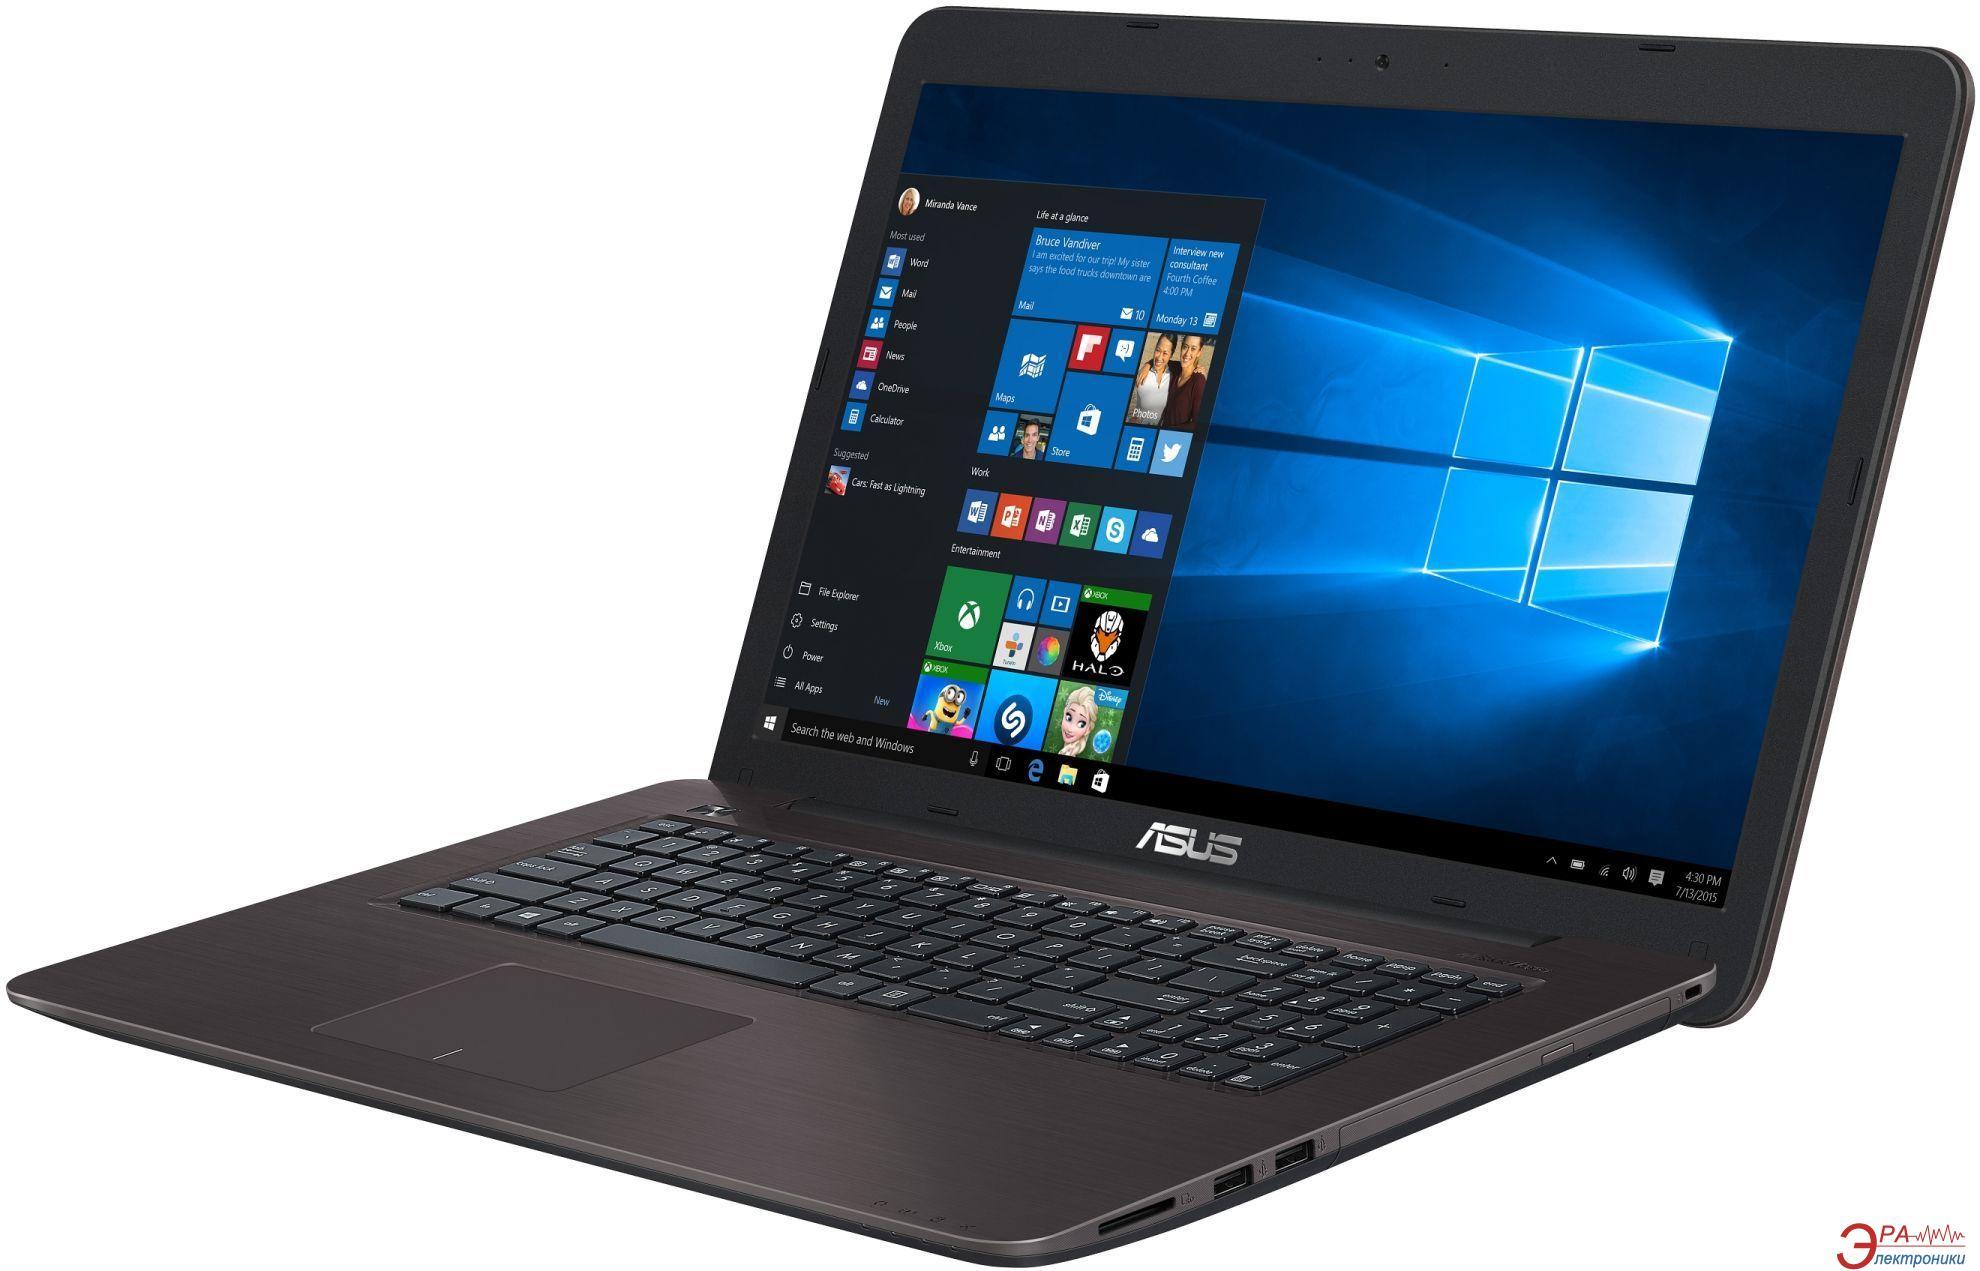 Ноутбук Asus X756UX-T4002D (90NB0A31-M00020) Brown 17,3